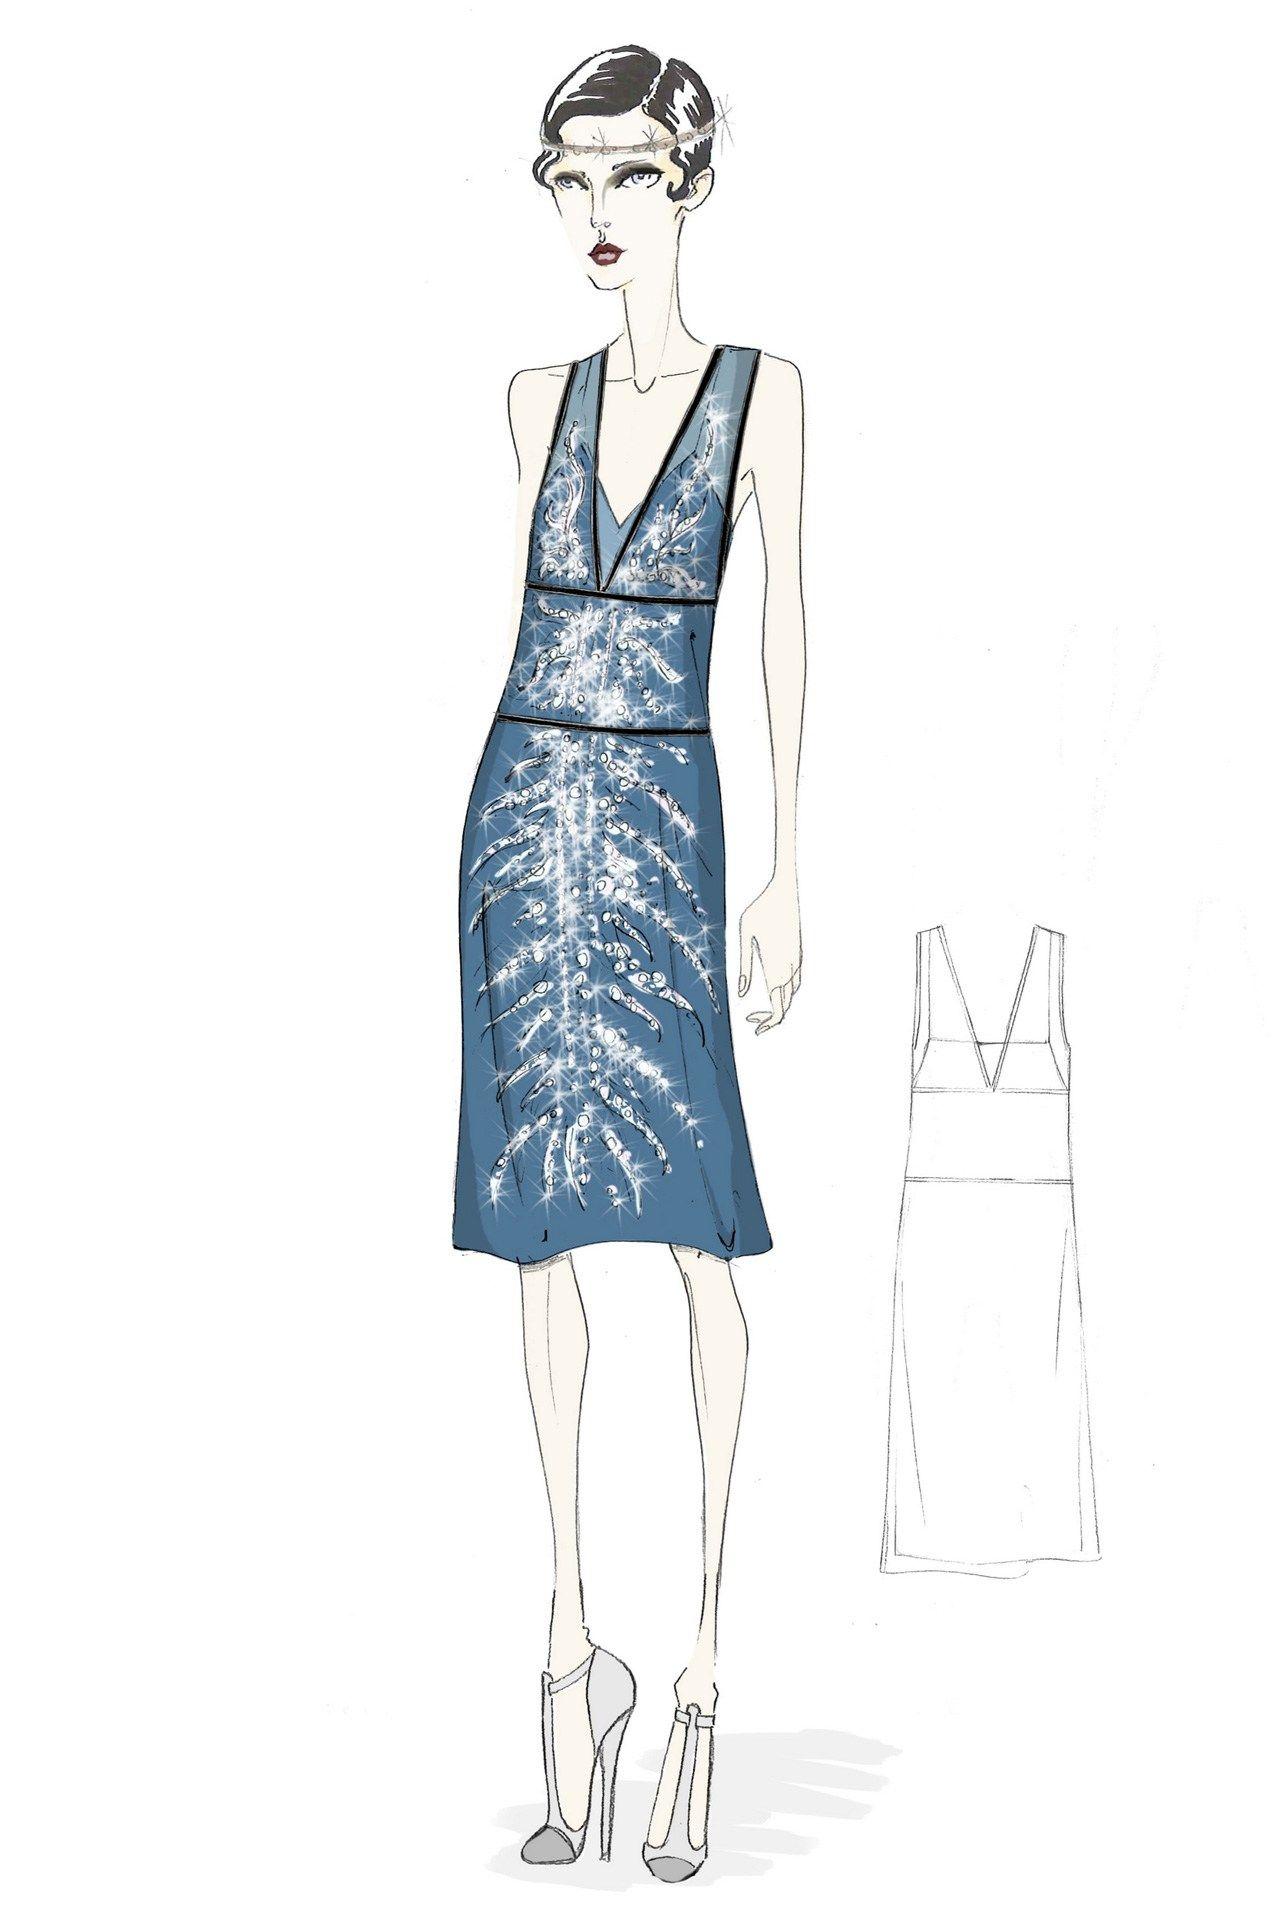 Great Gatsby Prada Costumes Preview | Bright lights, Swarovski and ...